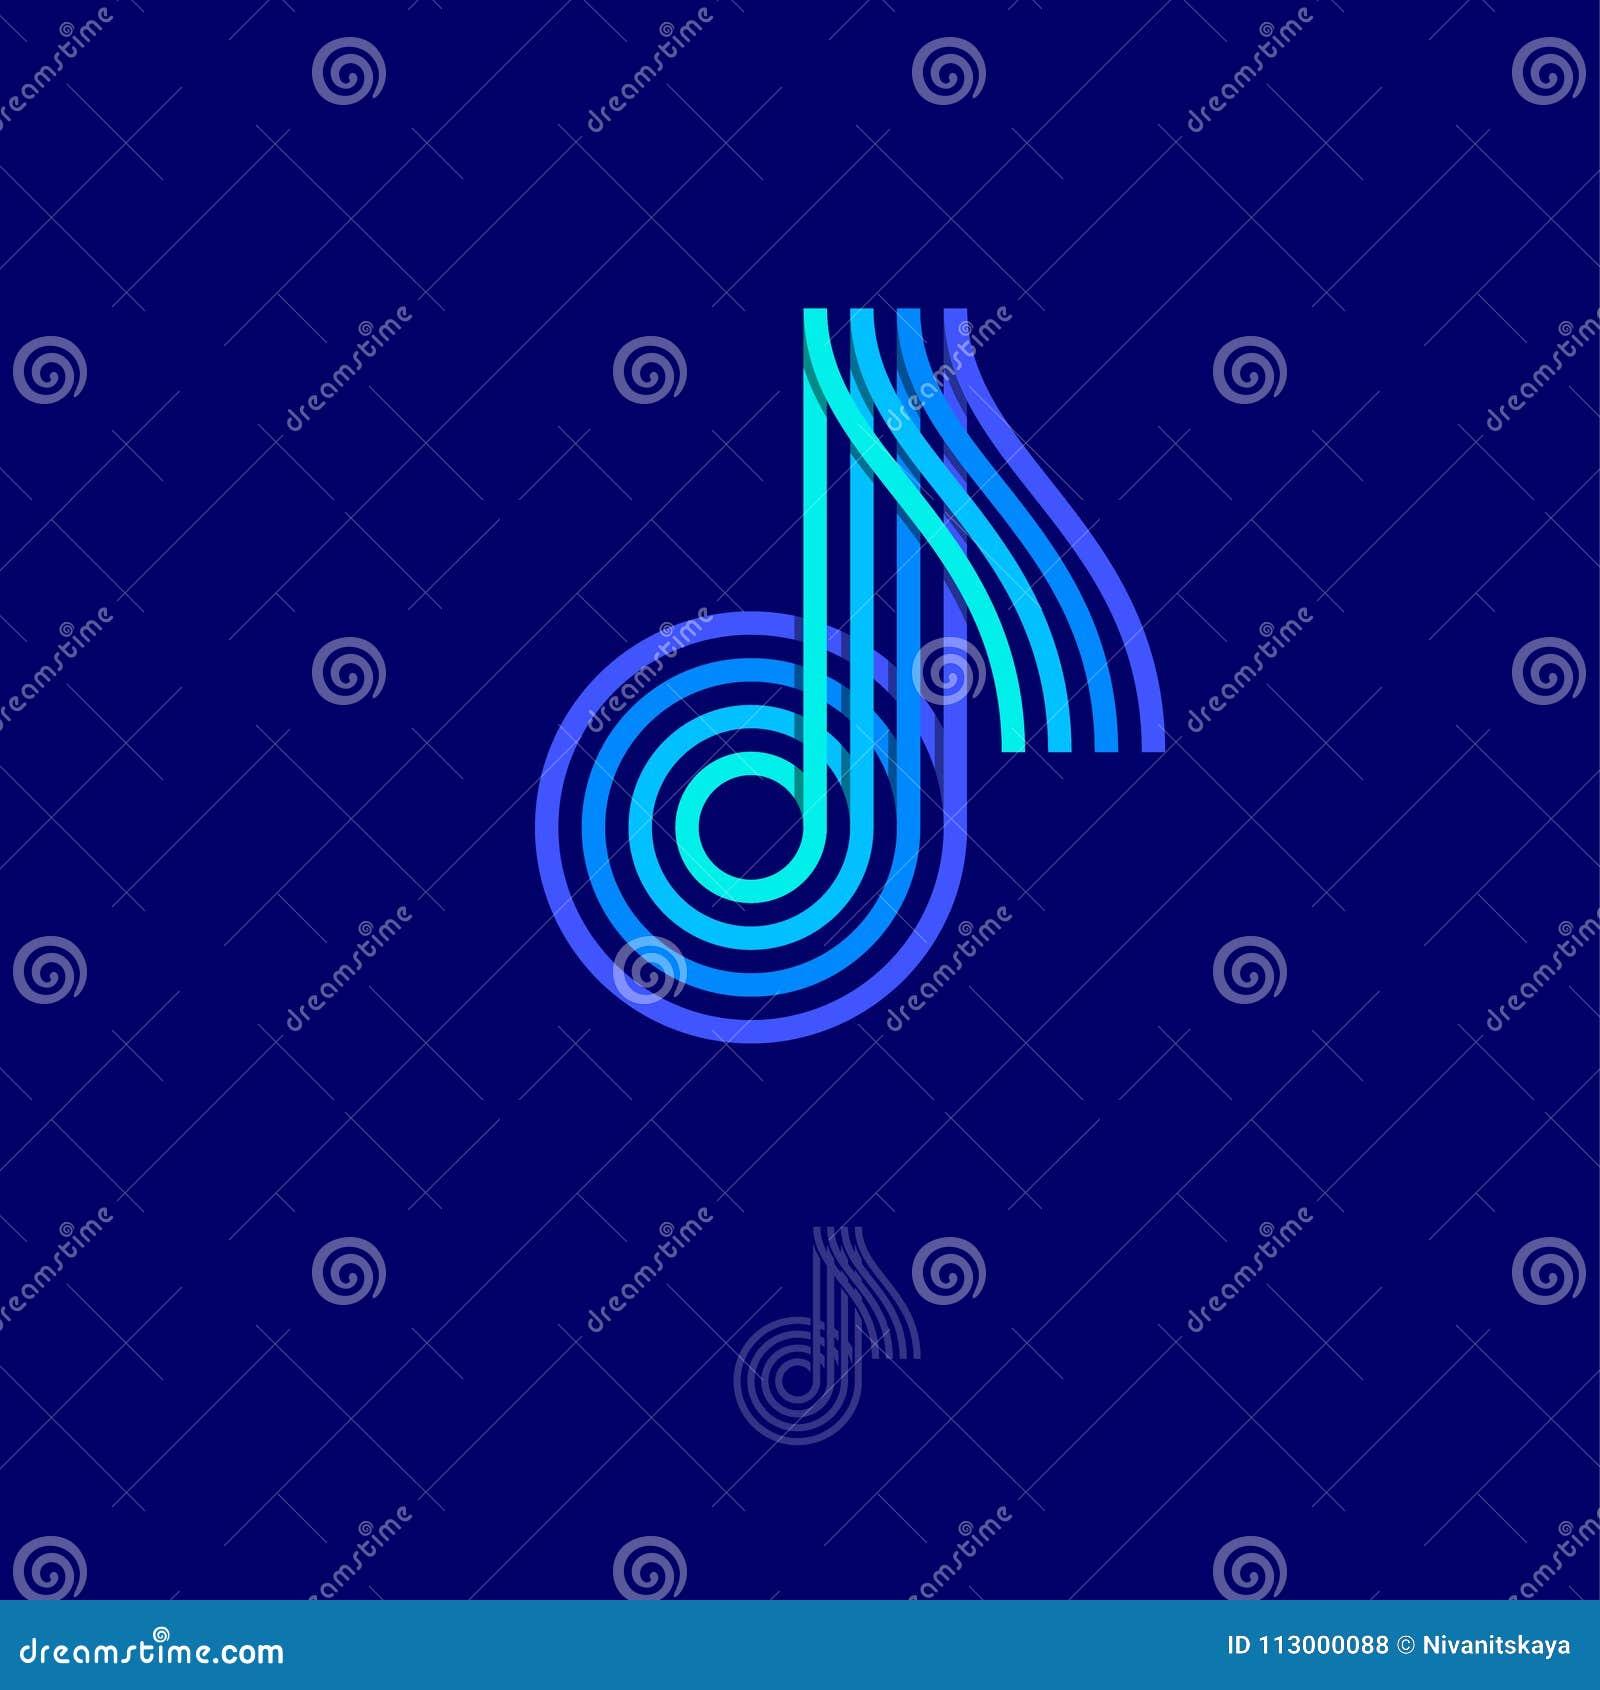 Muziekembleem Notaembleem Multi-colored embleem als nota over een donkere achtergrond